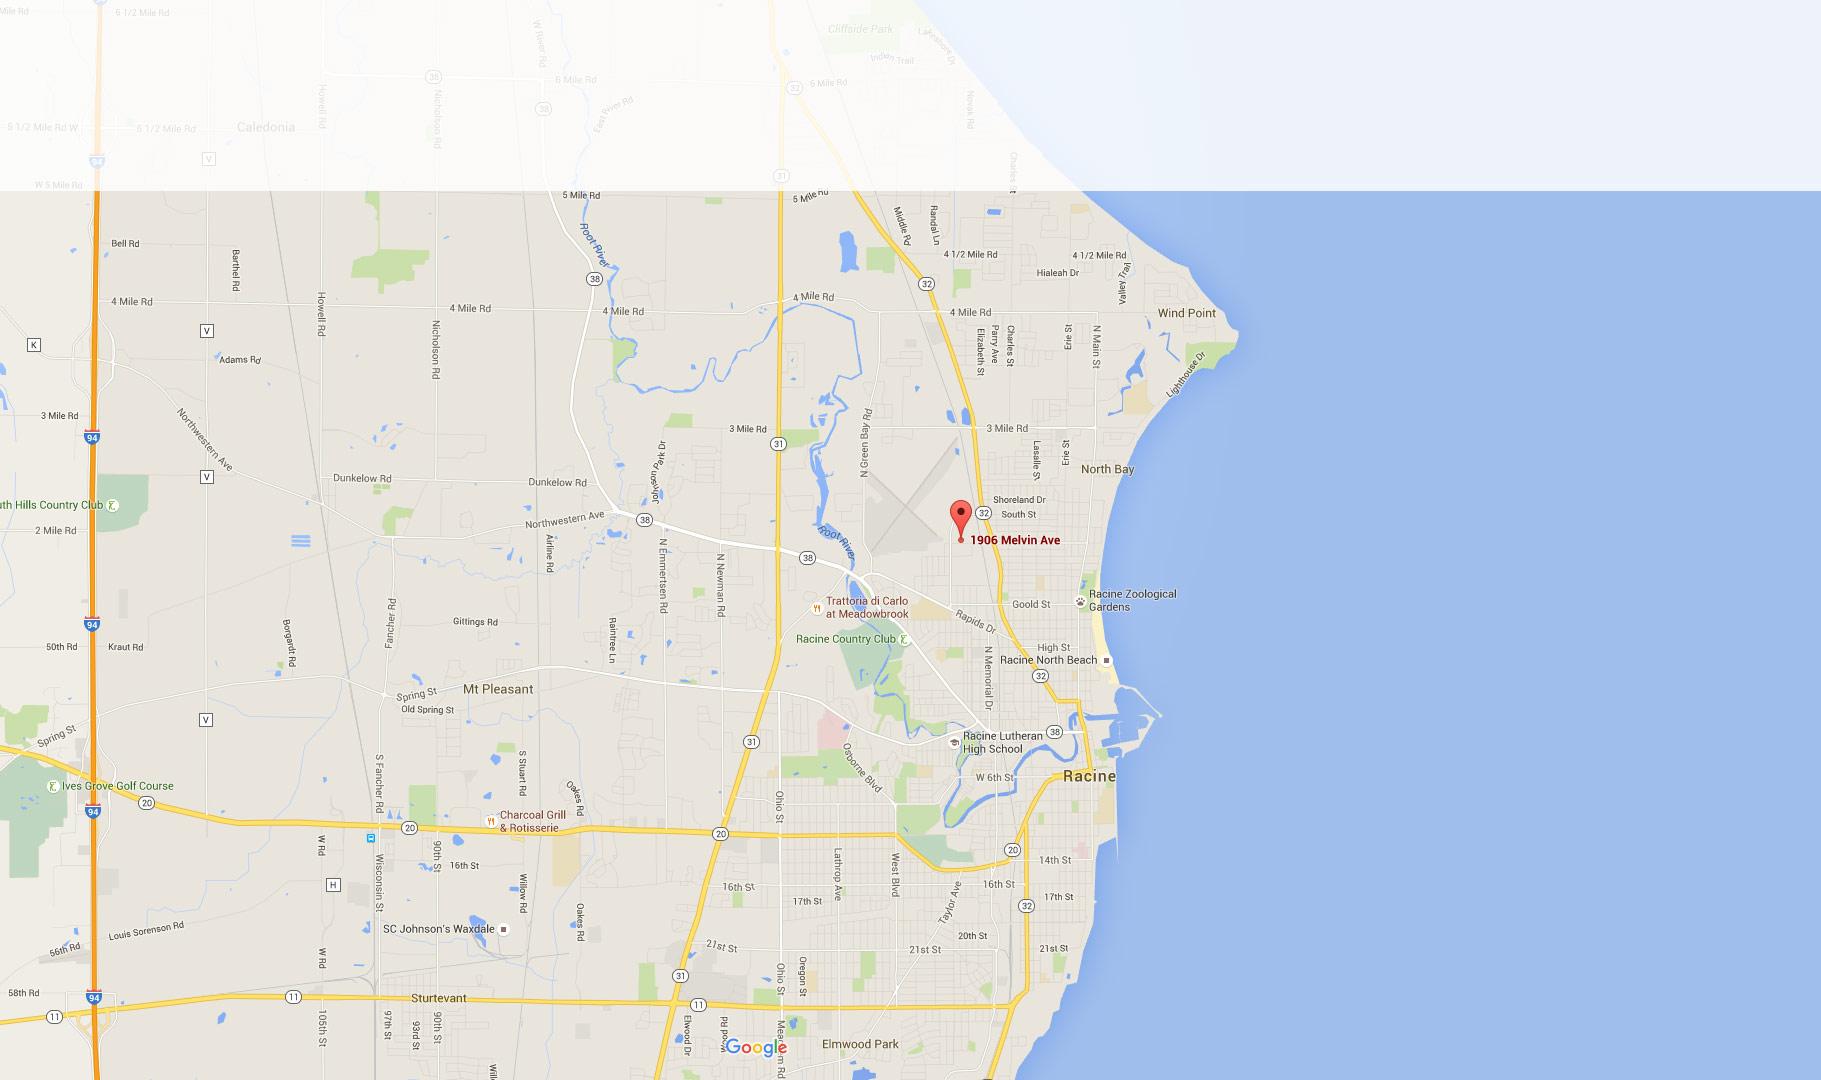 Racine Wisconsin Map.Map 1906 Melvin Ave Racine Wisconsin Nuwood Cabinets